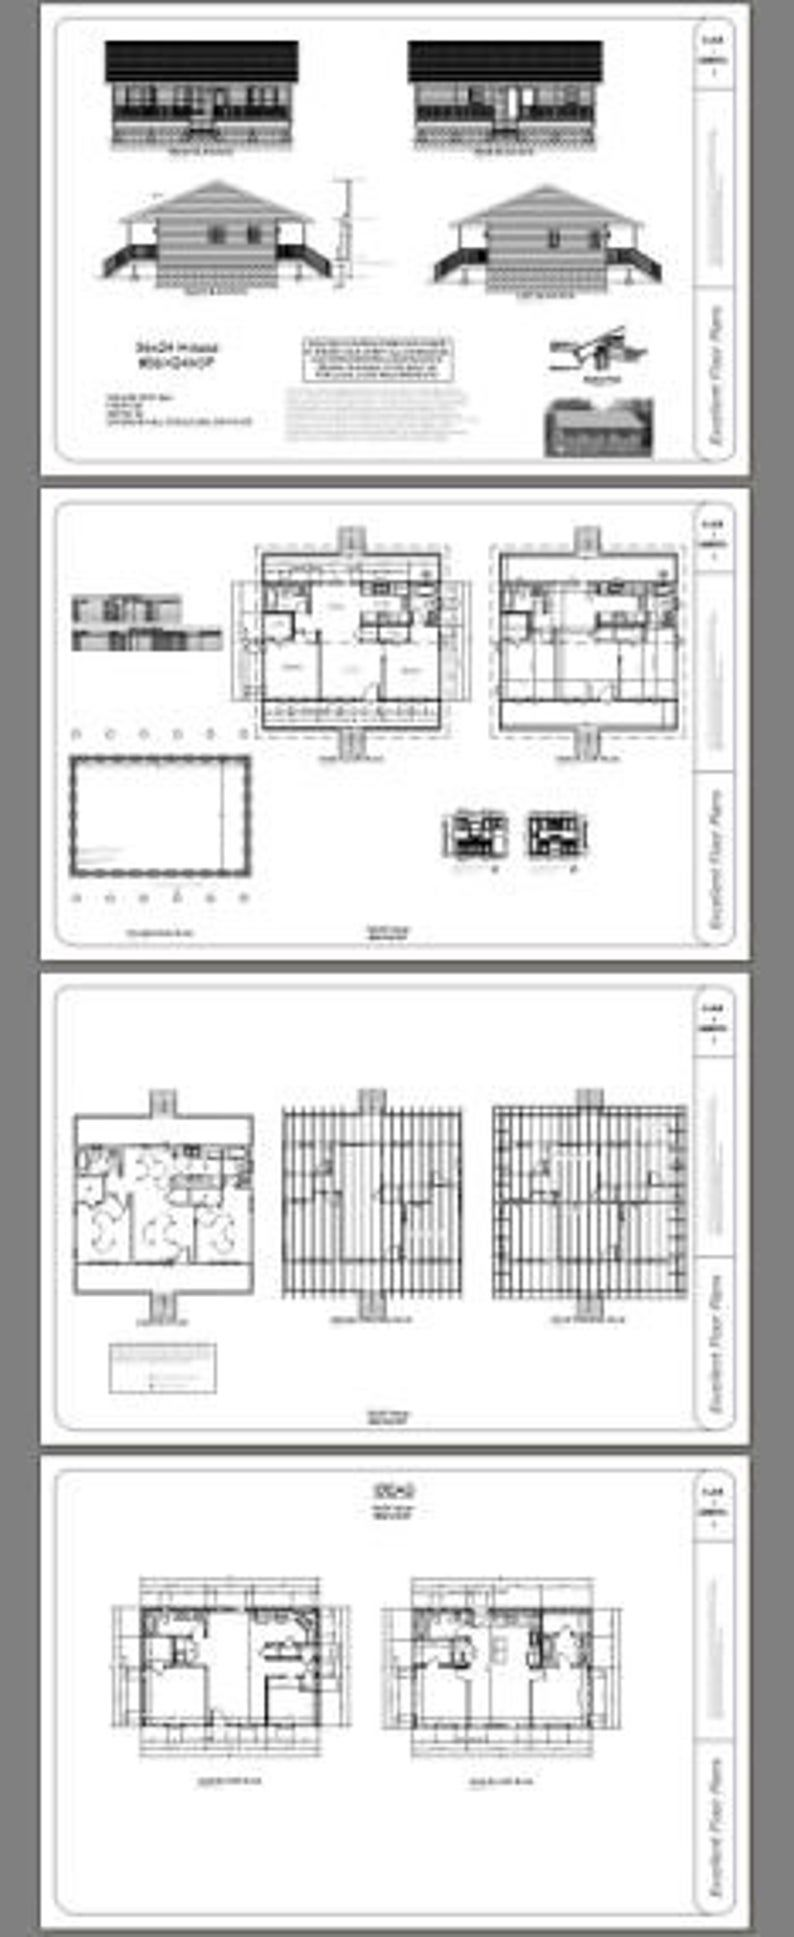 36x24 House 2 Bedroom 2 Bath 864 Sq Ft Pdf Floor Plan Etsy In 2020 Floor Plans Cabin House Plans Roof Framing